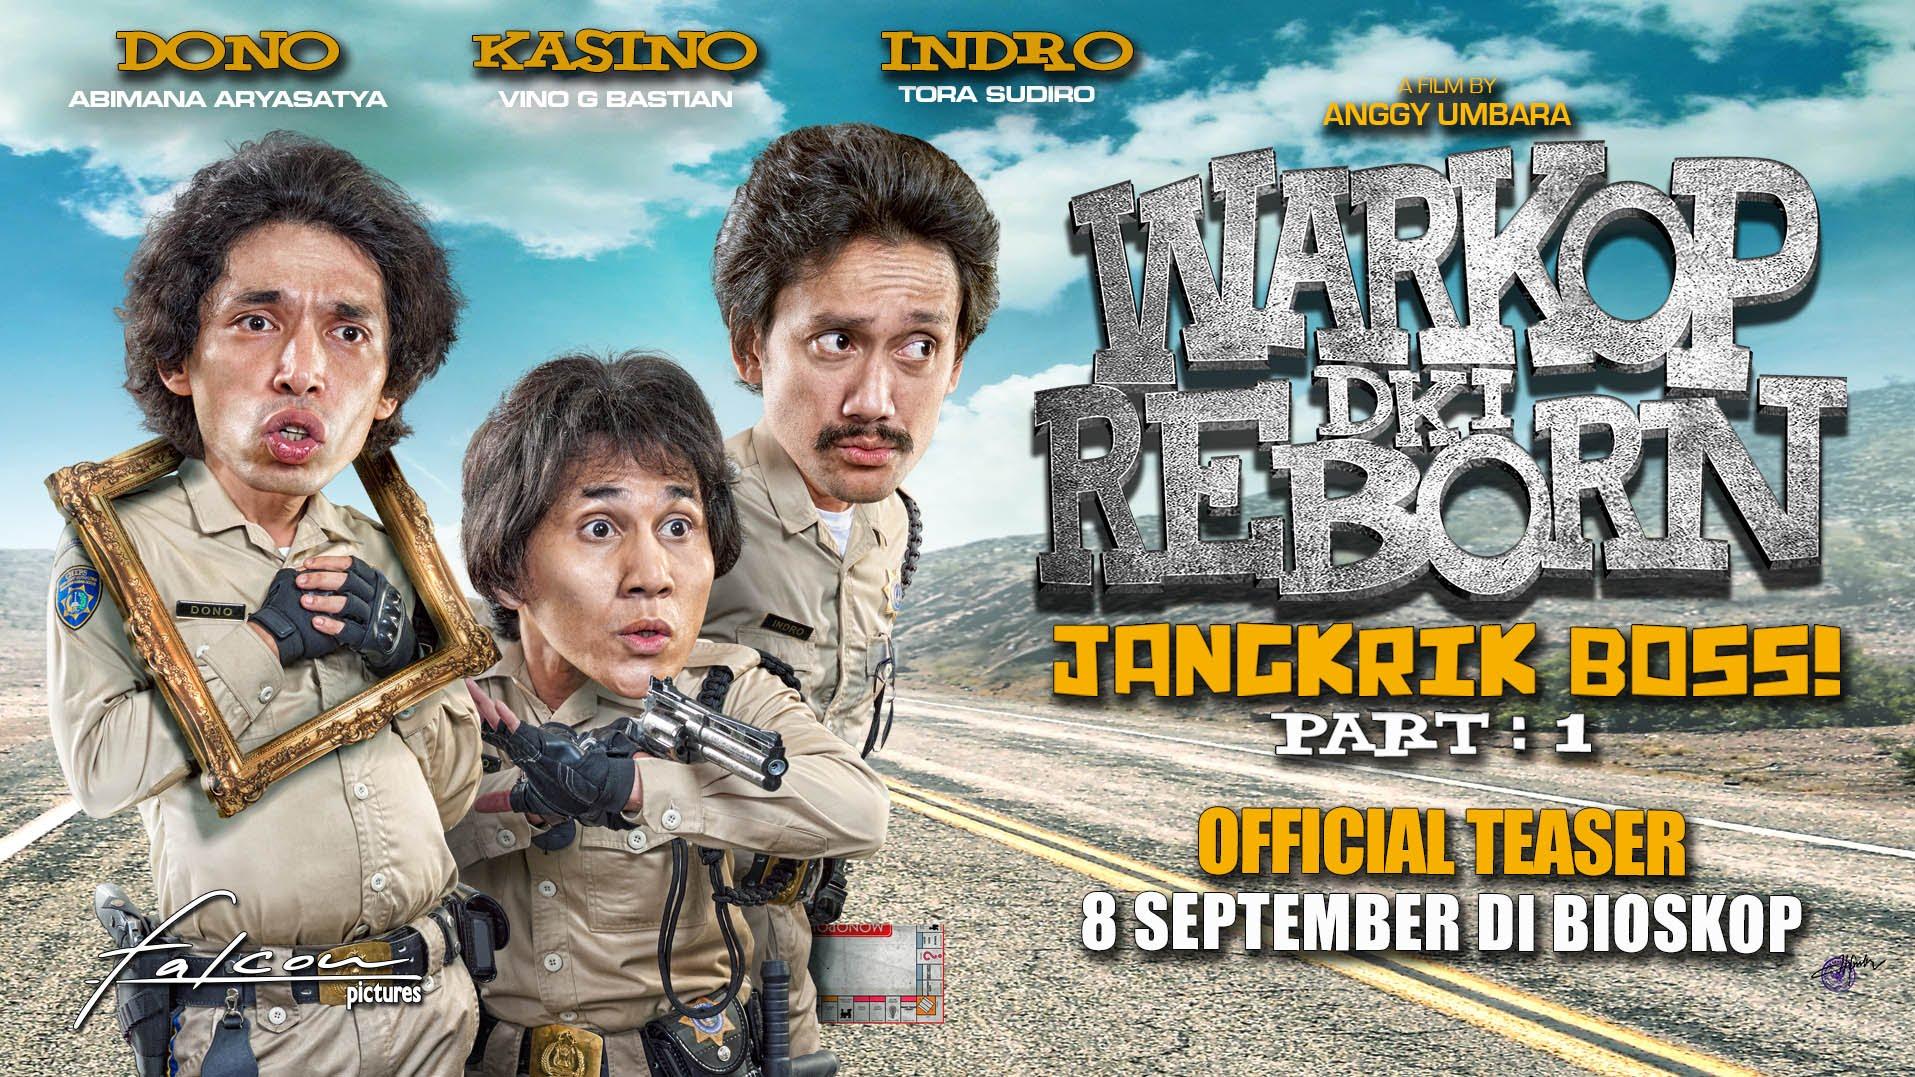 Photo of Inilah 5 Keunikan Dari Film Warkop DKI Reborn: Jangkrik Boss Part 1